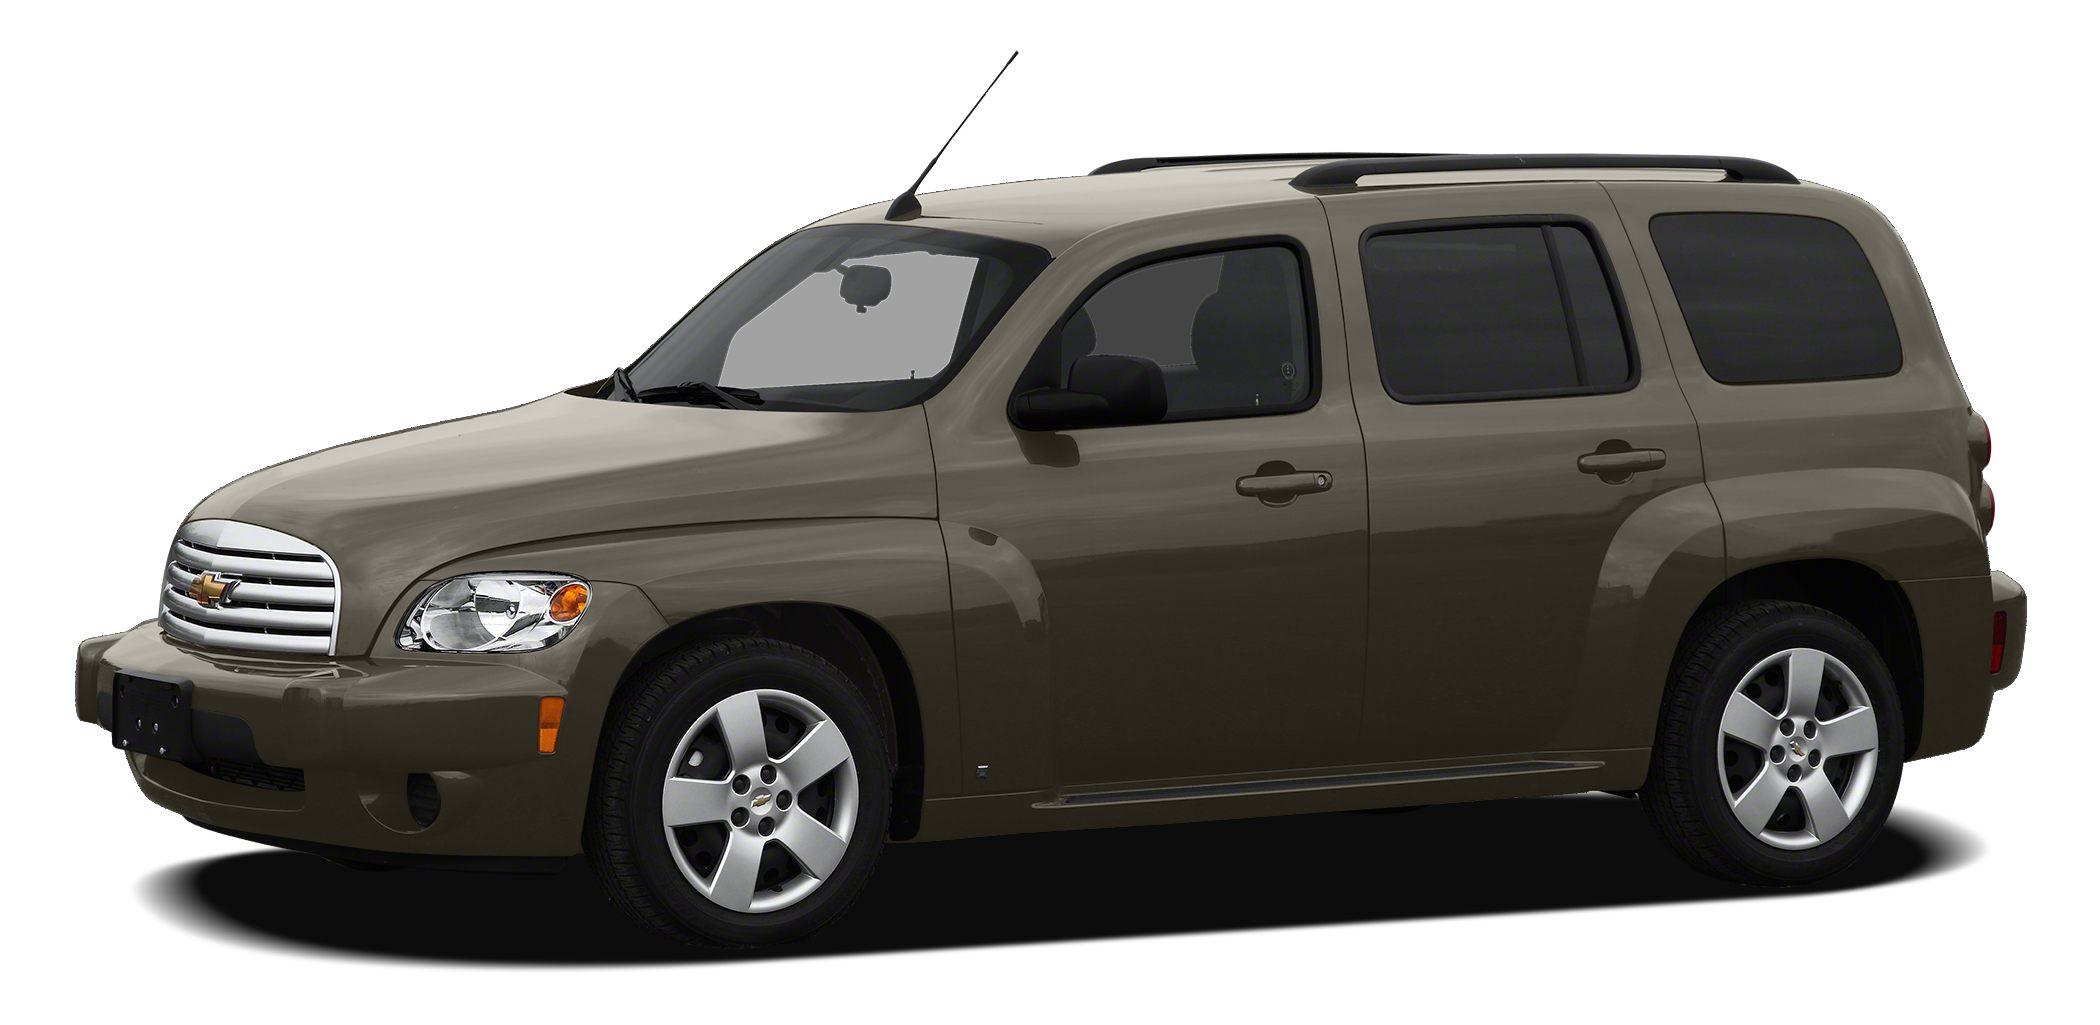 2011 Chevrolet HHR LT Miles 0Color Mocha Stock TRK15111A VIN 3GNBABFW4BS543707